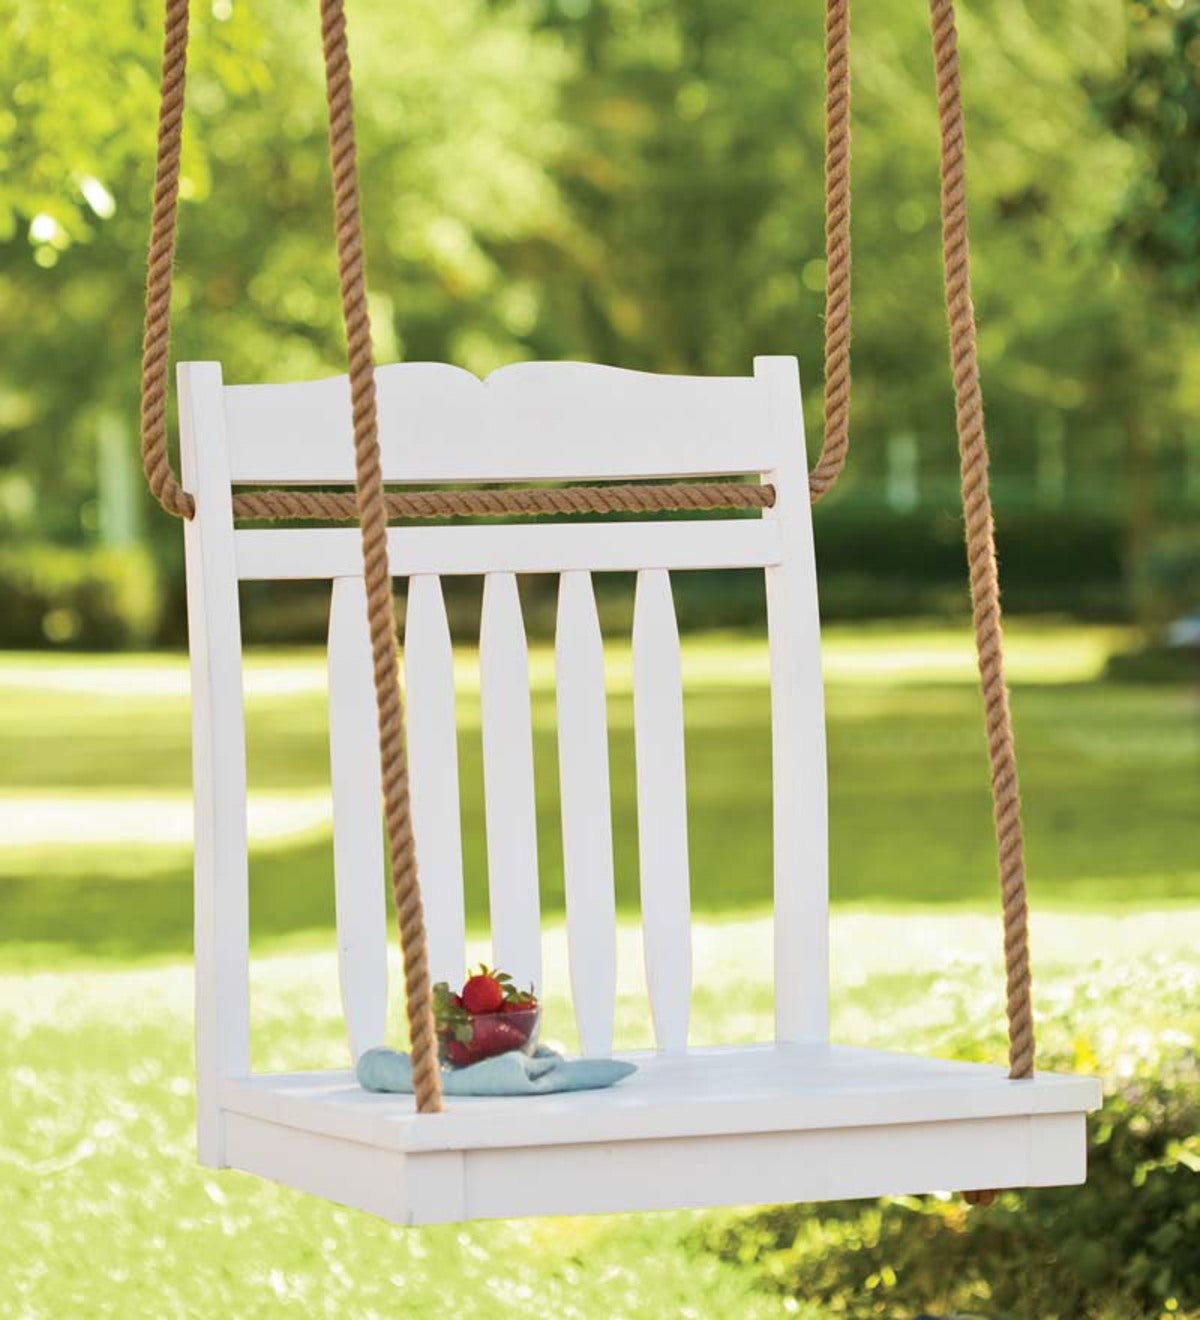 Hanging Chair Tree Swing Plowhearth